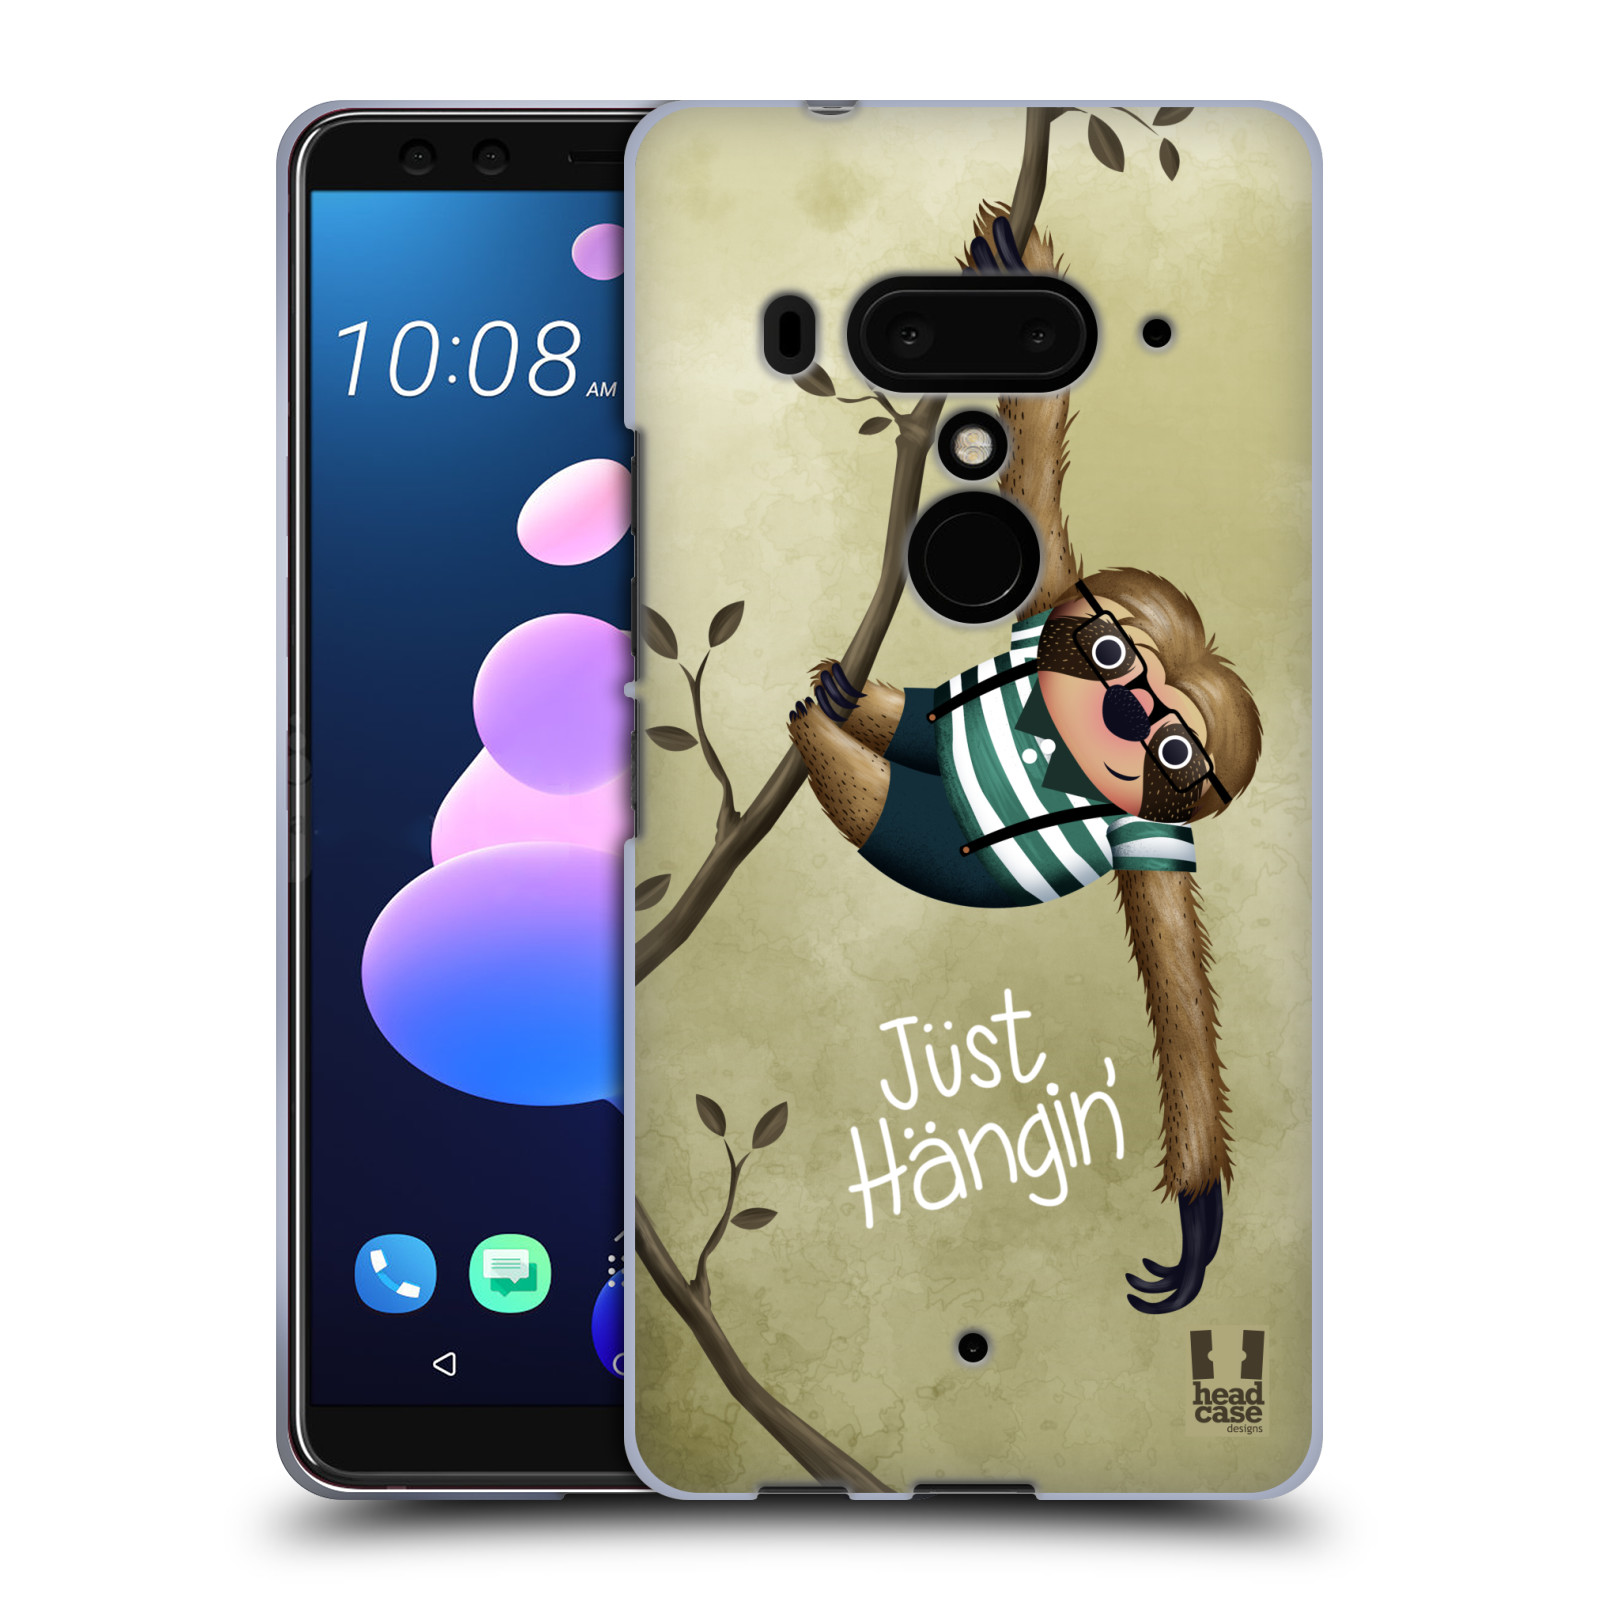 Silikonové pouzdro na mobil HTC U12 Plus - Head Case - Lenochod Just Hangin